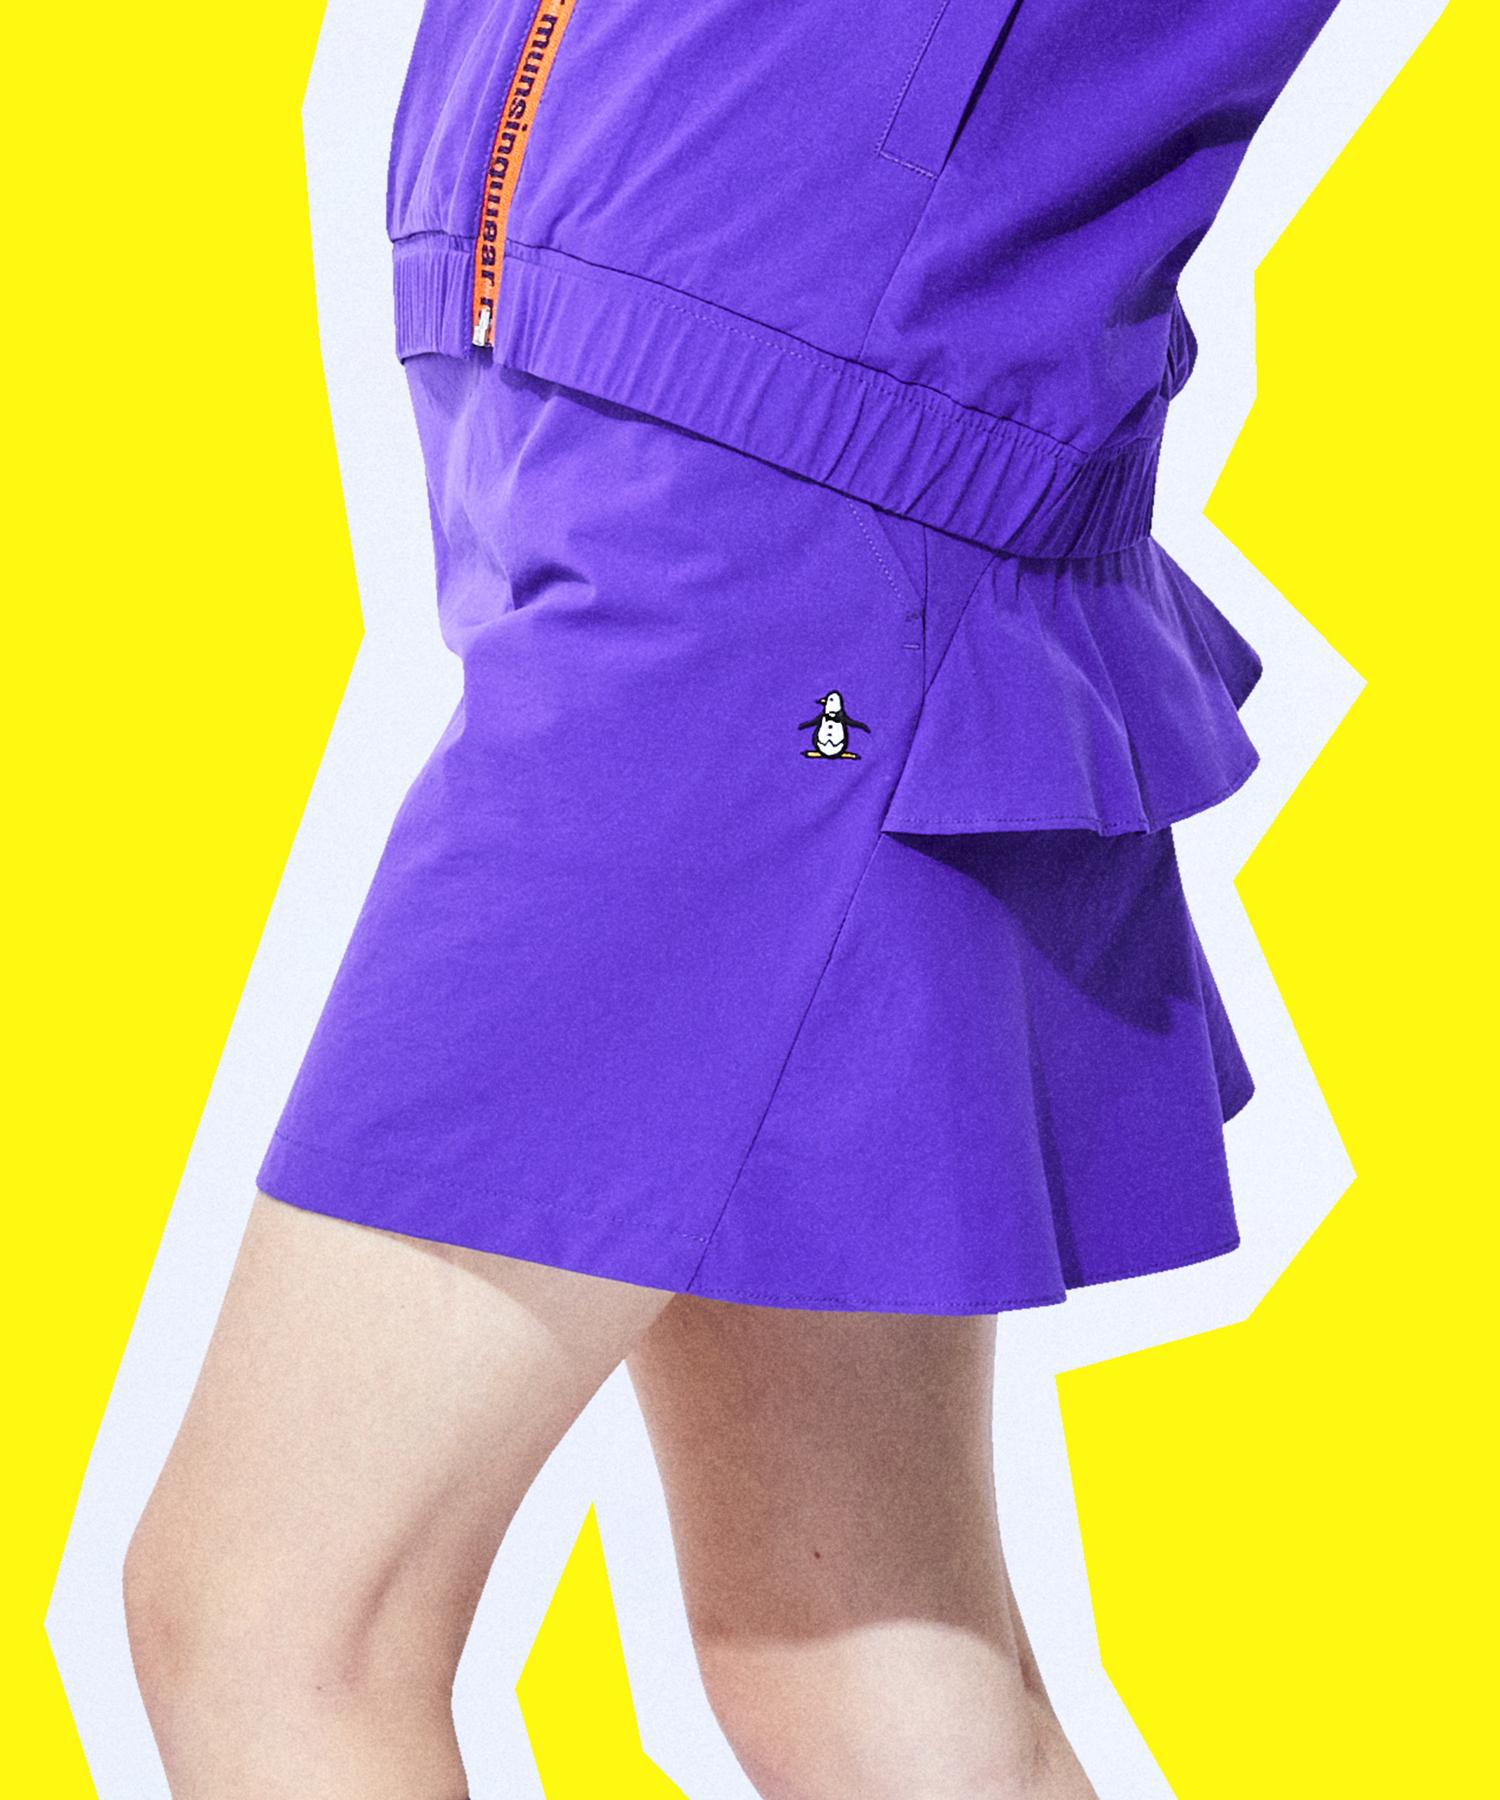 【ENVOY】360°ストレッチワッシャースカート(インパンツ付/38cm丈)